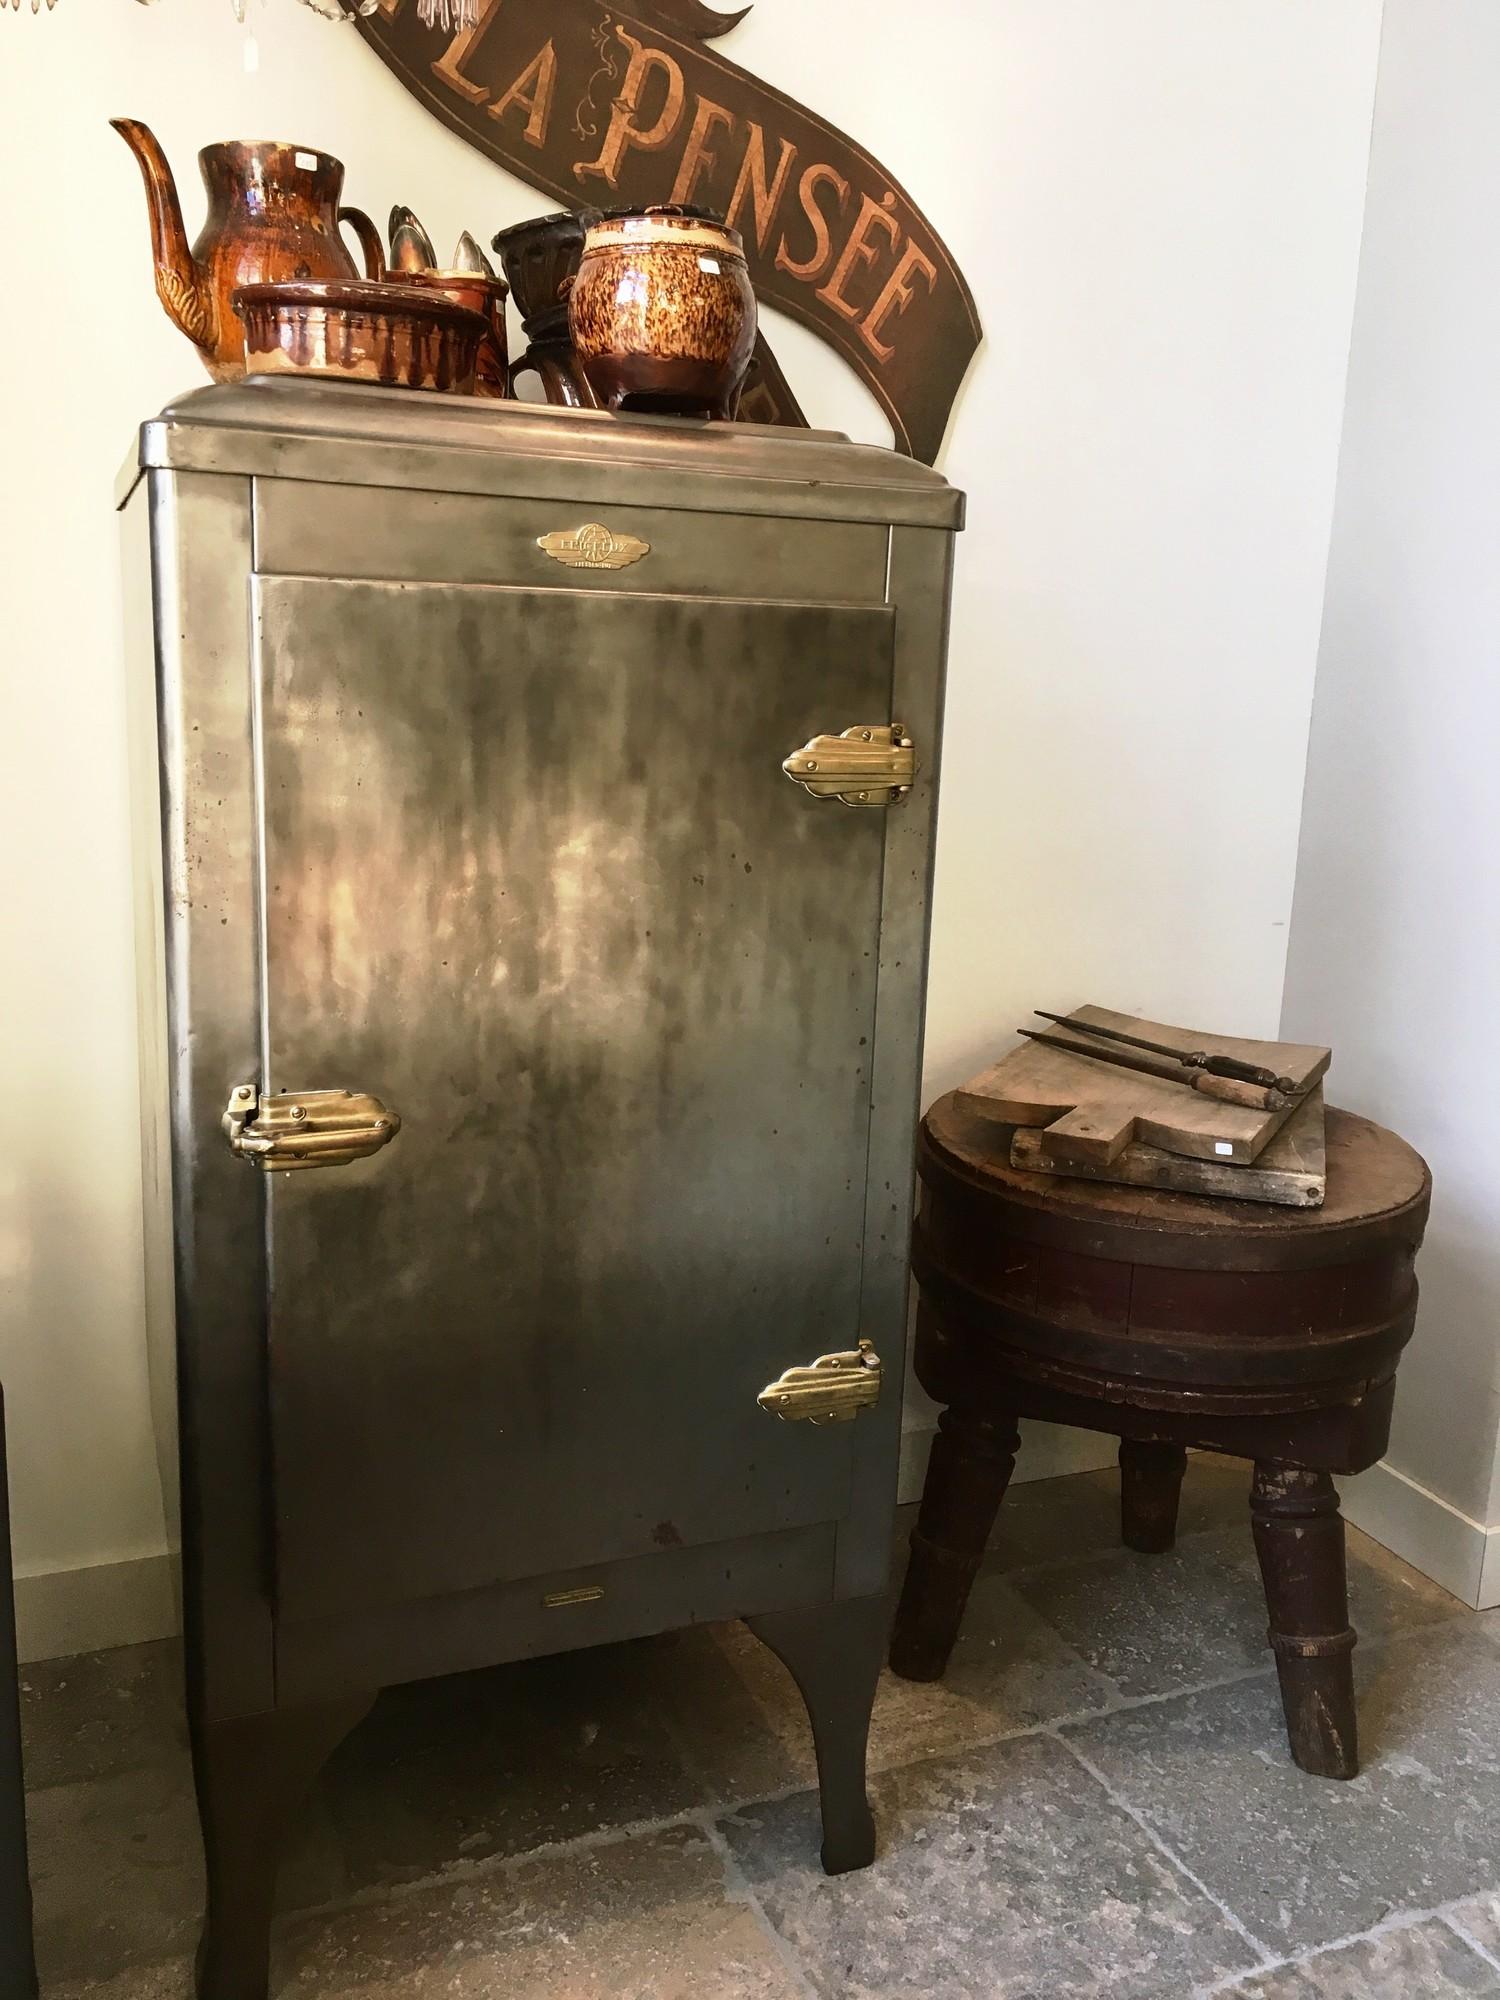 Begin 20e eeuwse koelkast